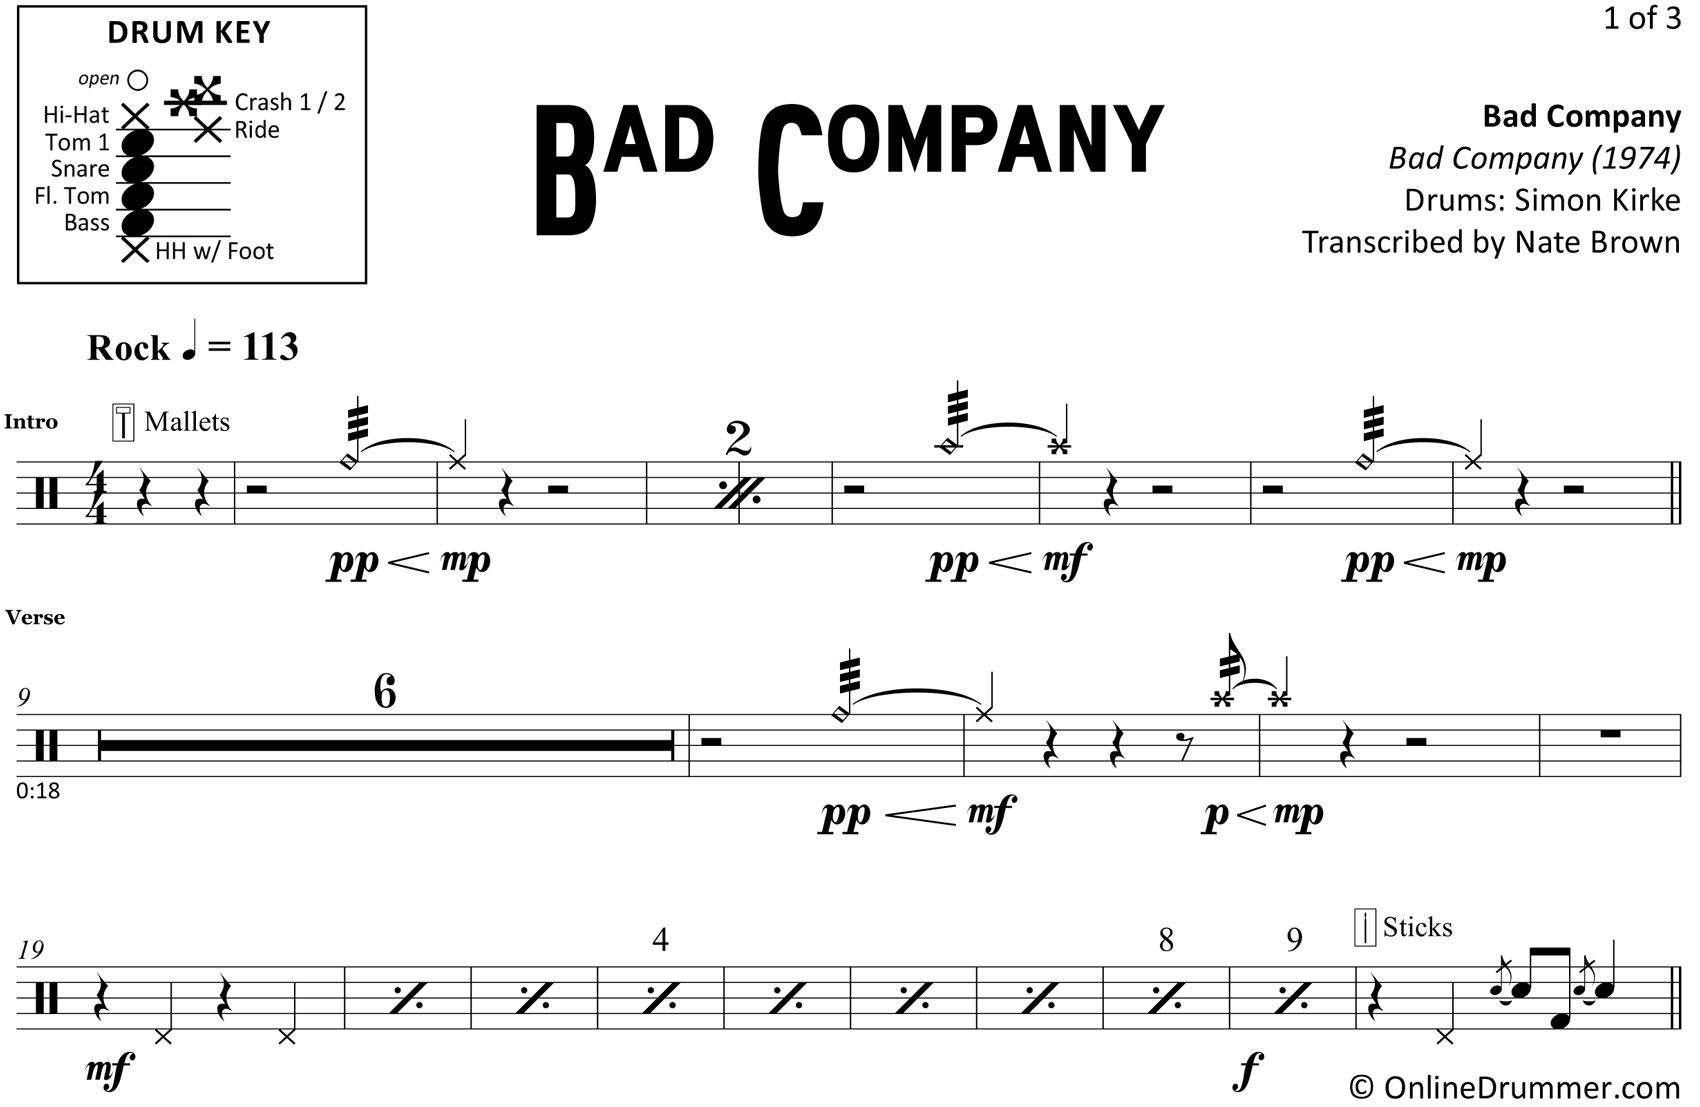 Bad Company - Bad Company - Drum Sheet Music